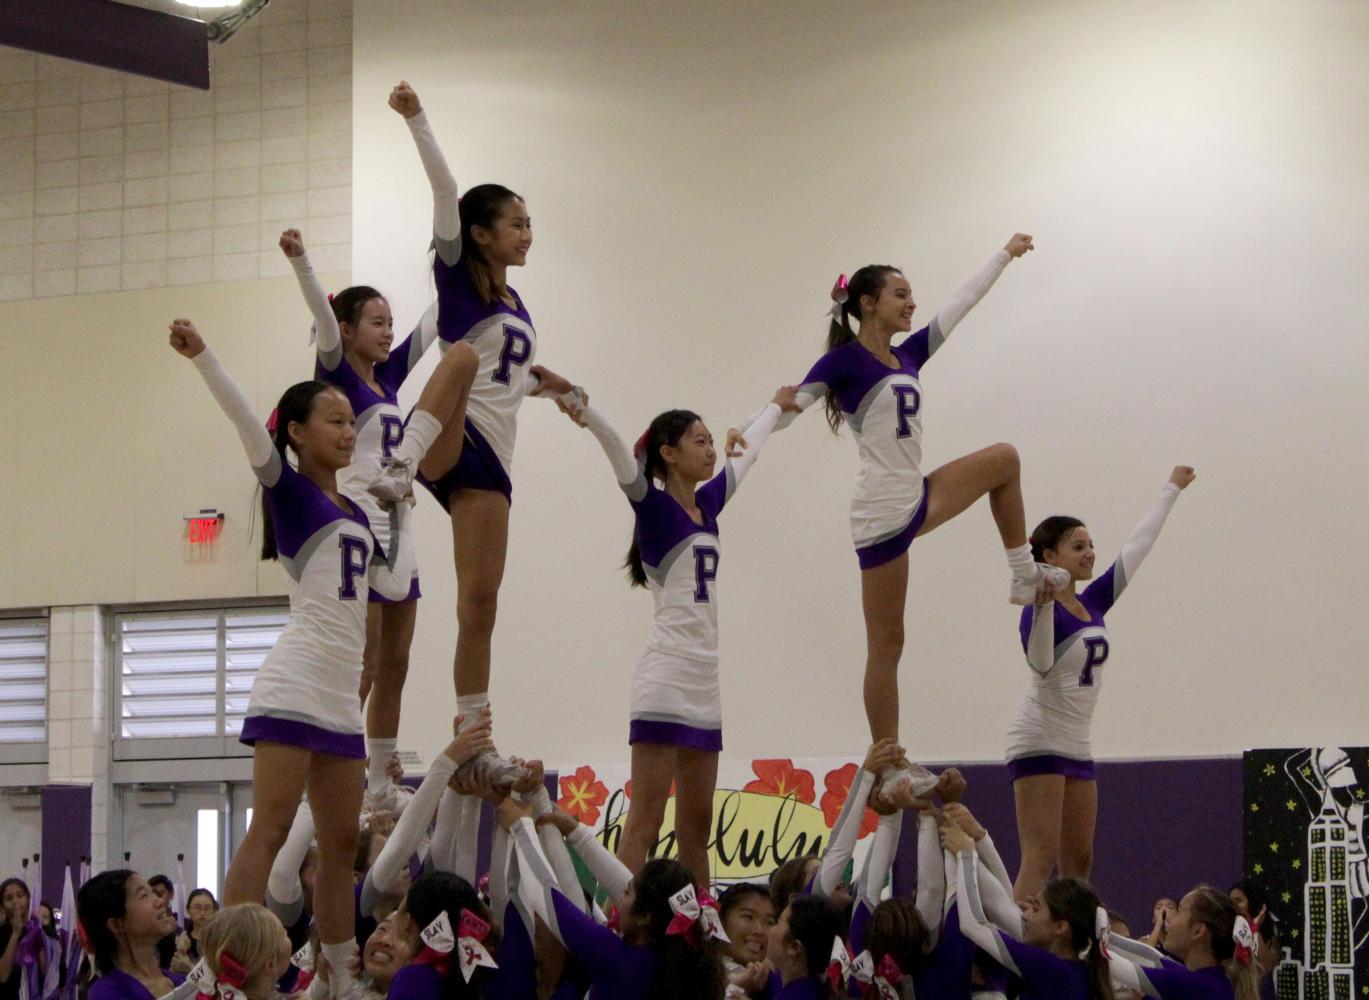 Cheerleaders Leyna Liu, Vivian Lin, Jessalyn Nguyen, Mary Lu, Ryan Aguilar and Yarden Gilat hit the mark in their final formation.